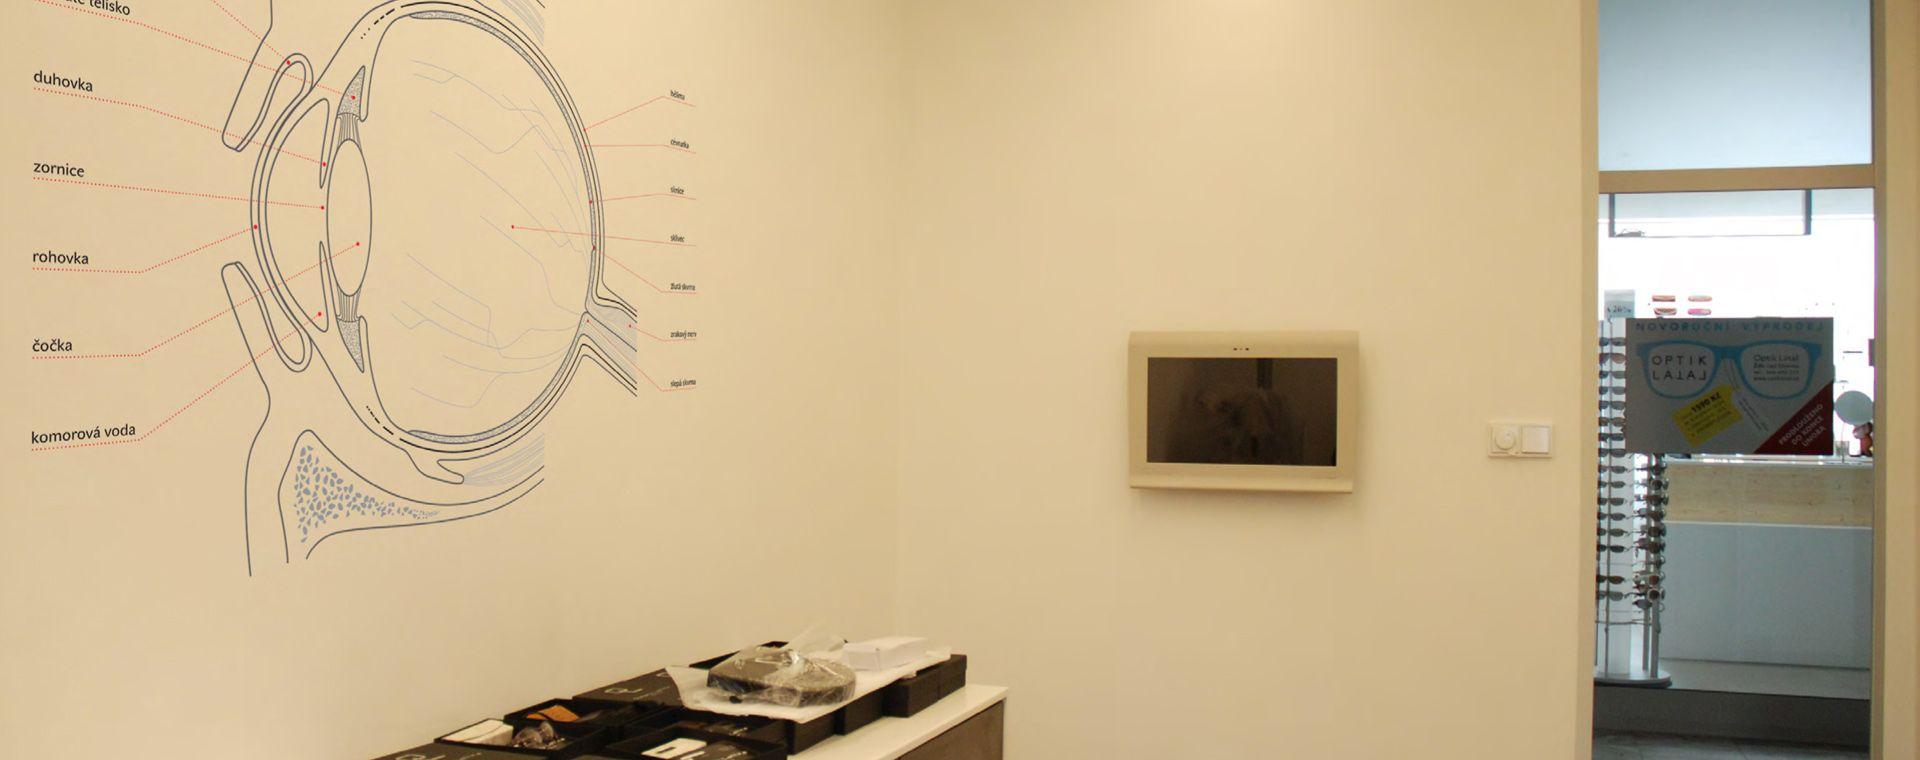 The optician store and optician check room, Žďár nad Sázavou, 2011-2013, CZ